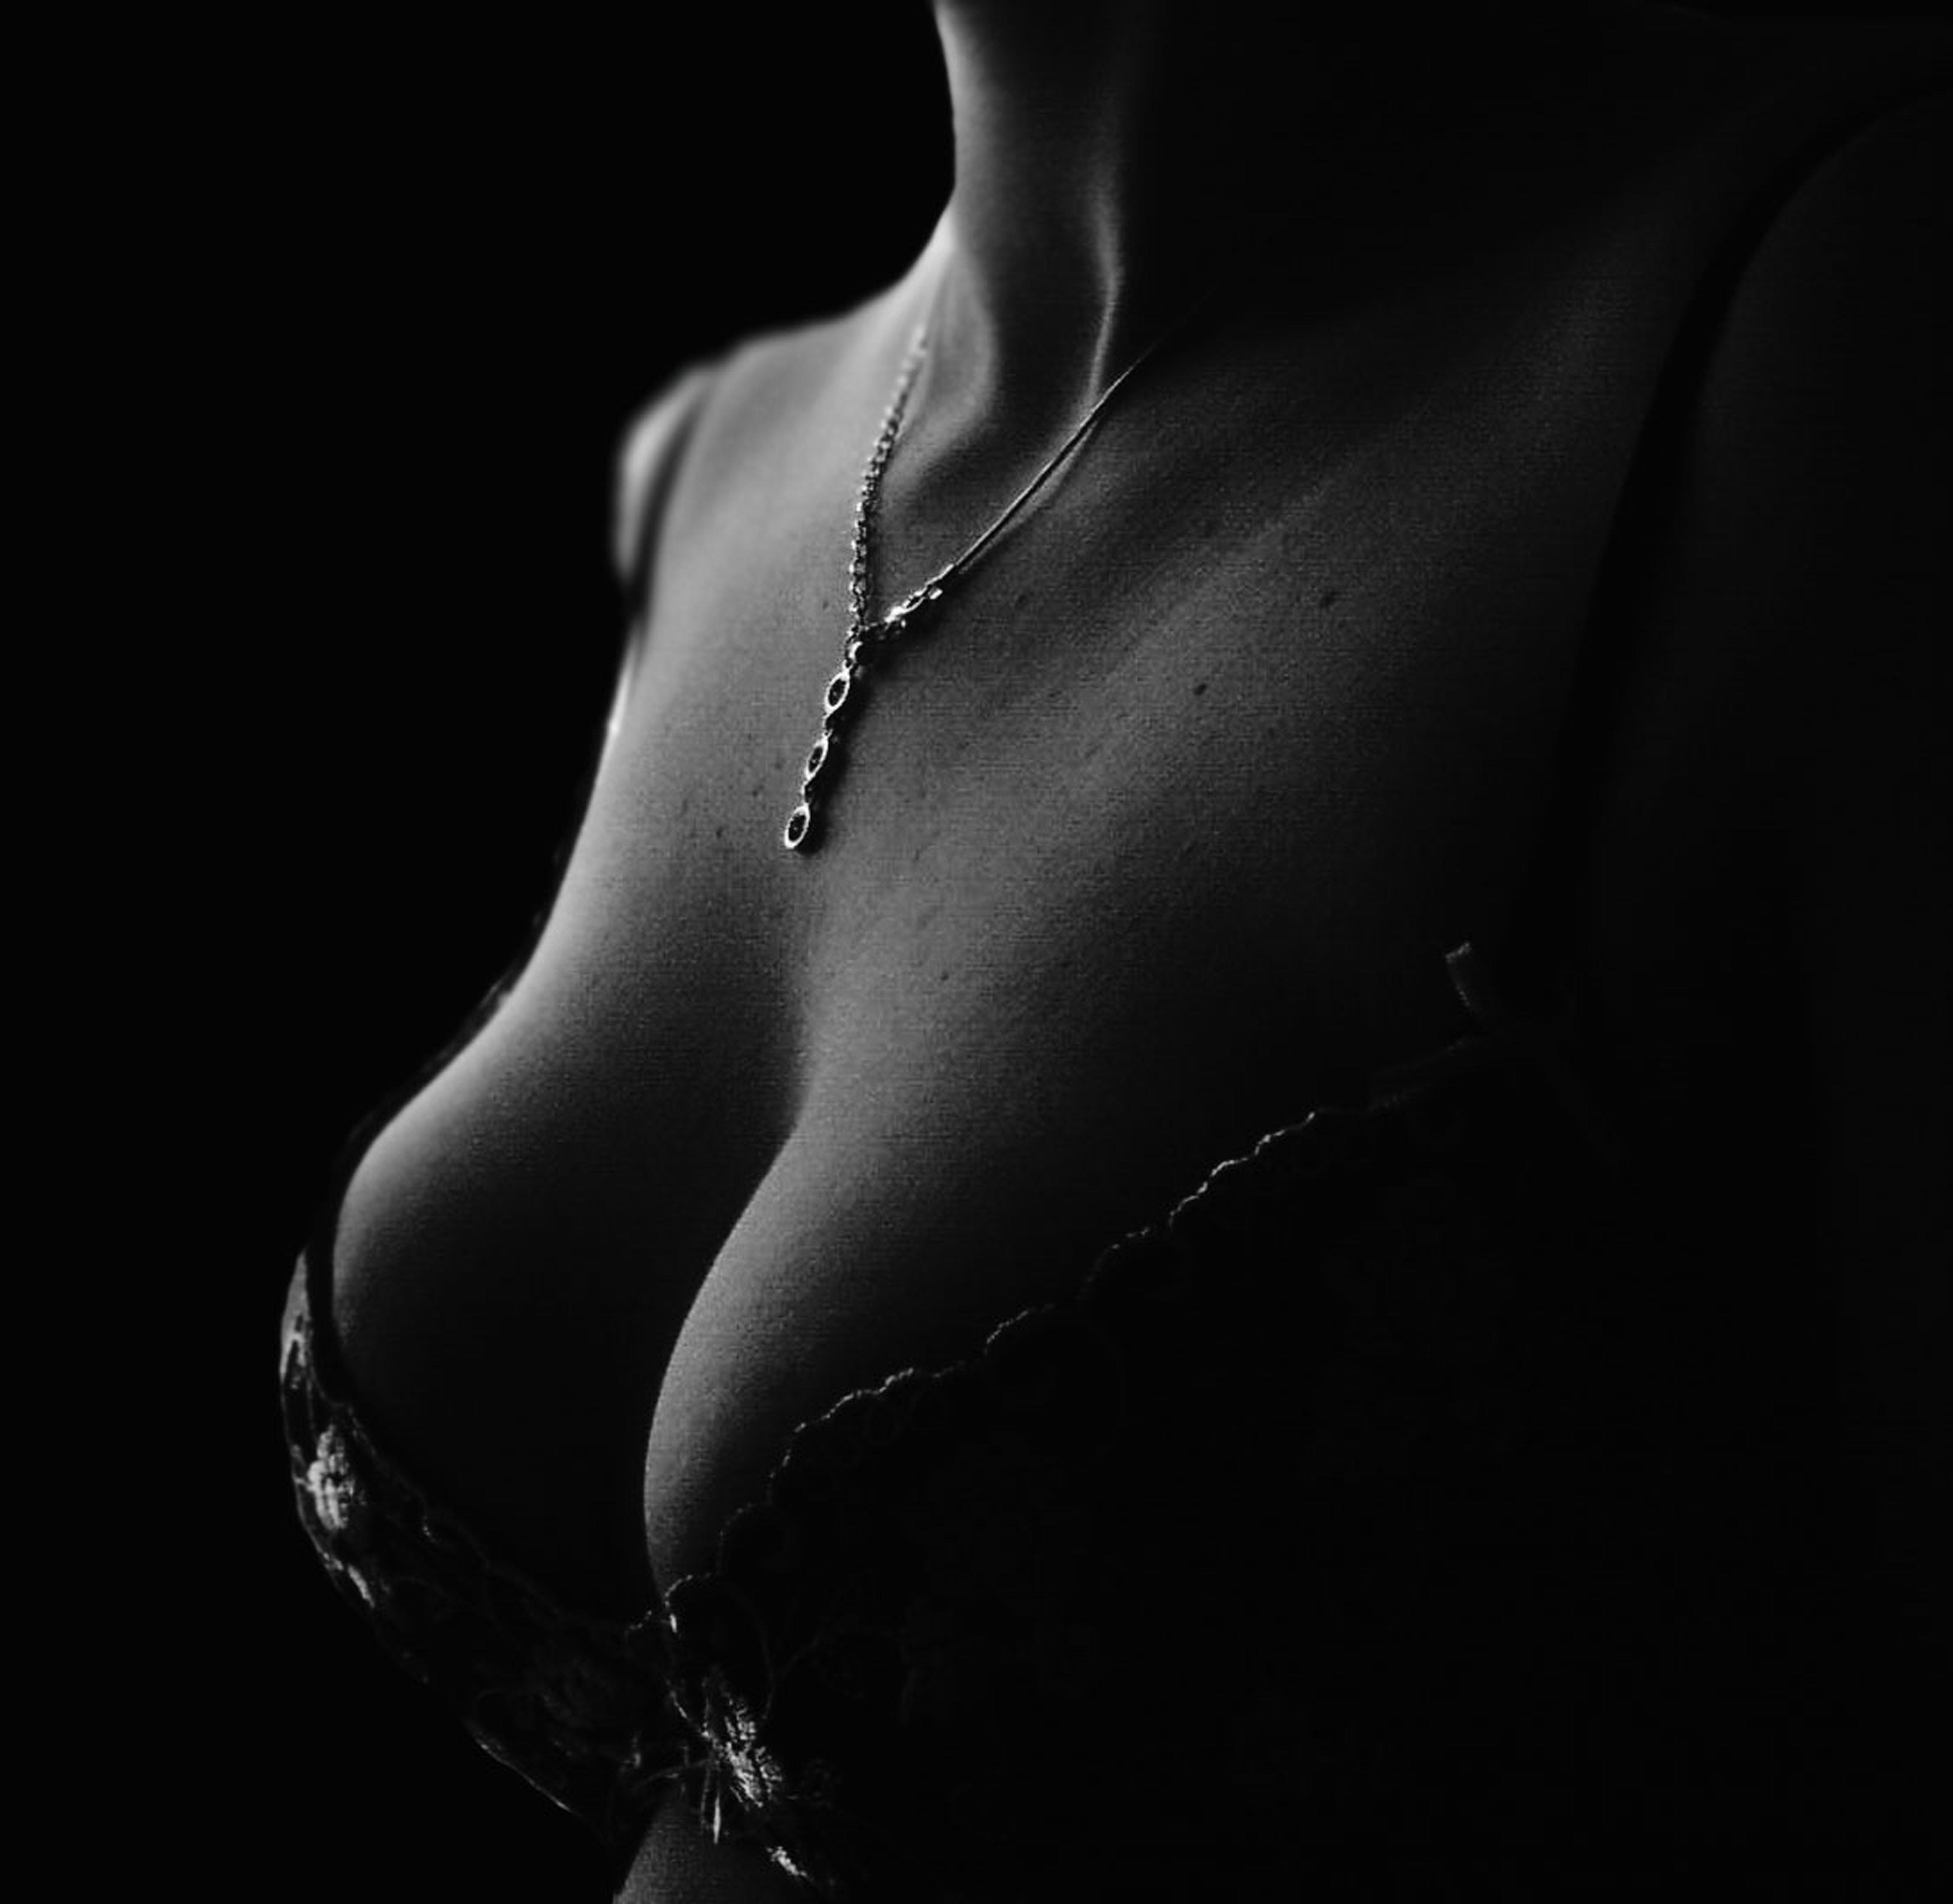 Free stock photo of woman, body, chain, beauty